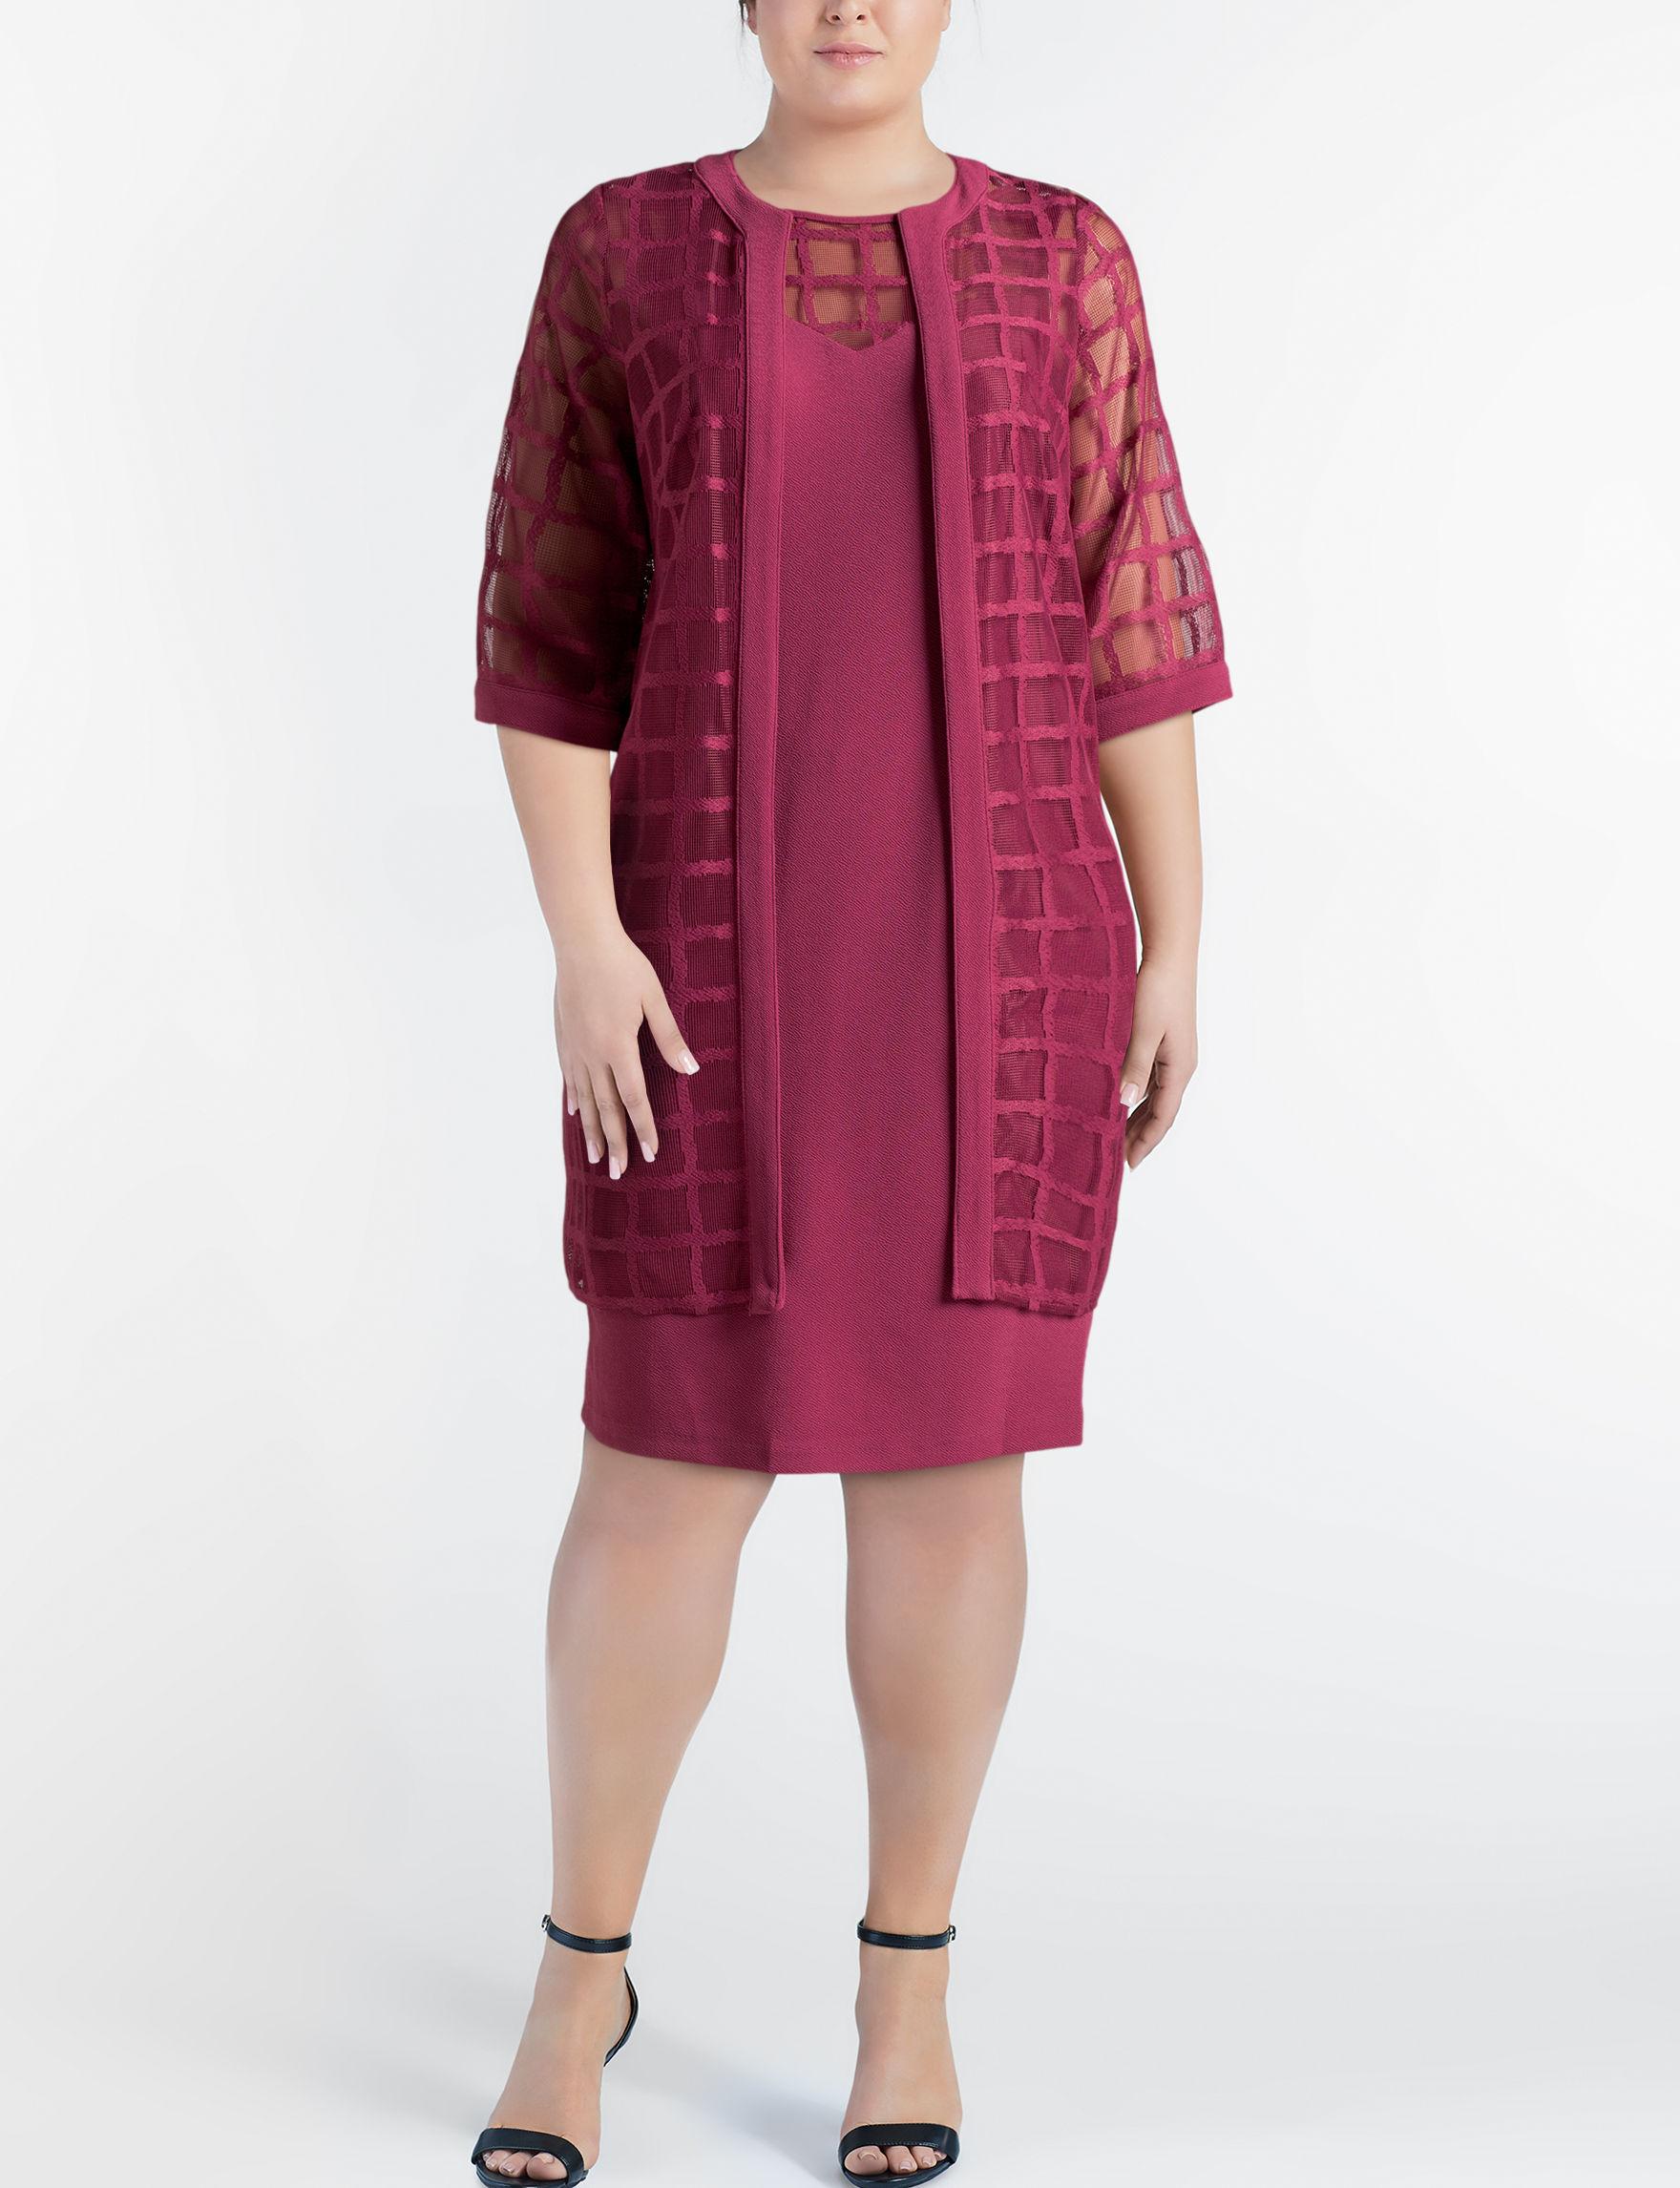 Maya Brooke Red Everyday & Casual Jacket Dresses